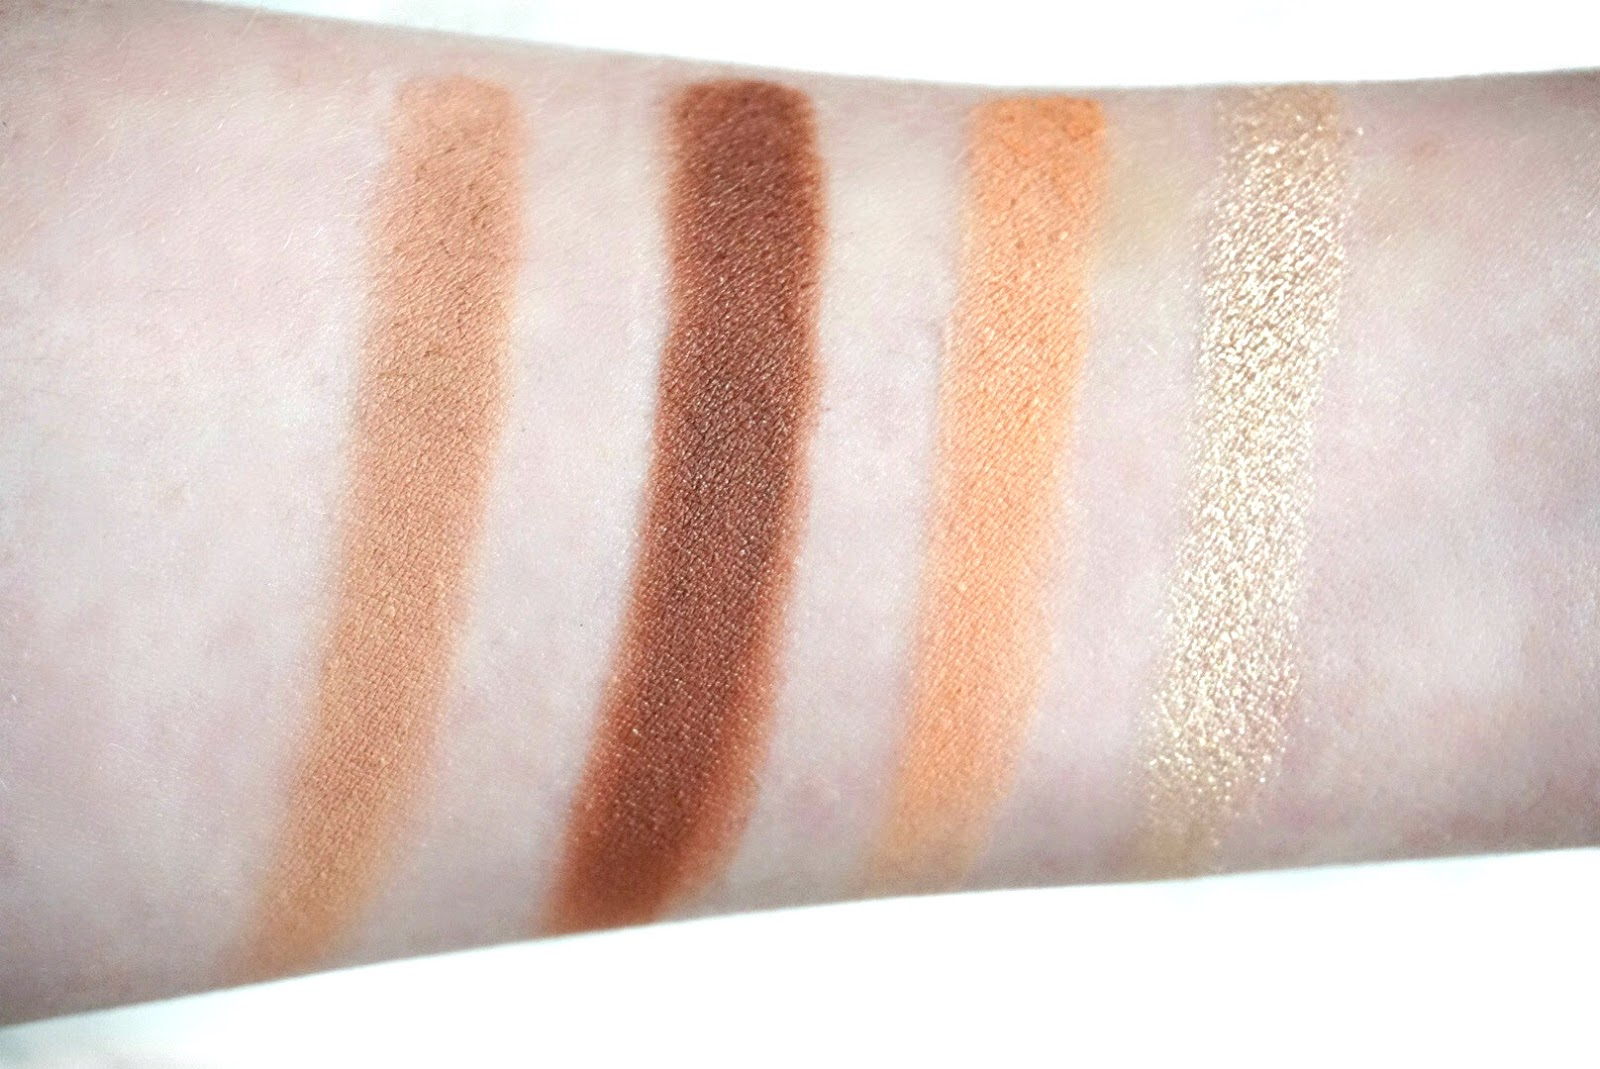 Colourpop Peachy Keen Eyeshadow Swatches